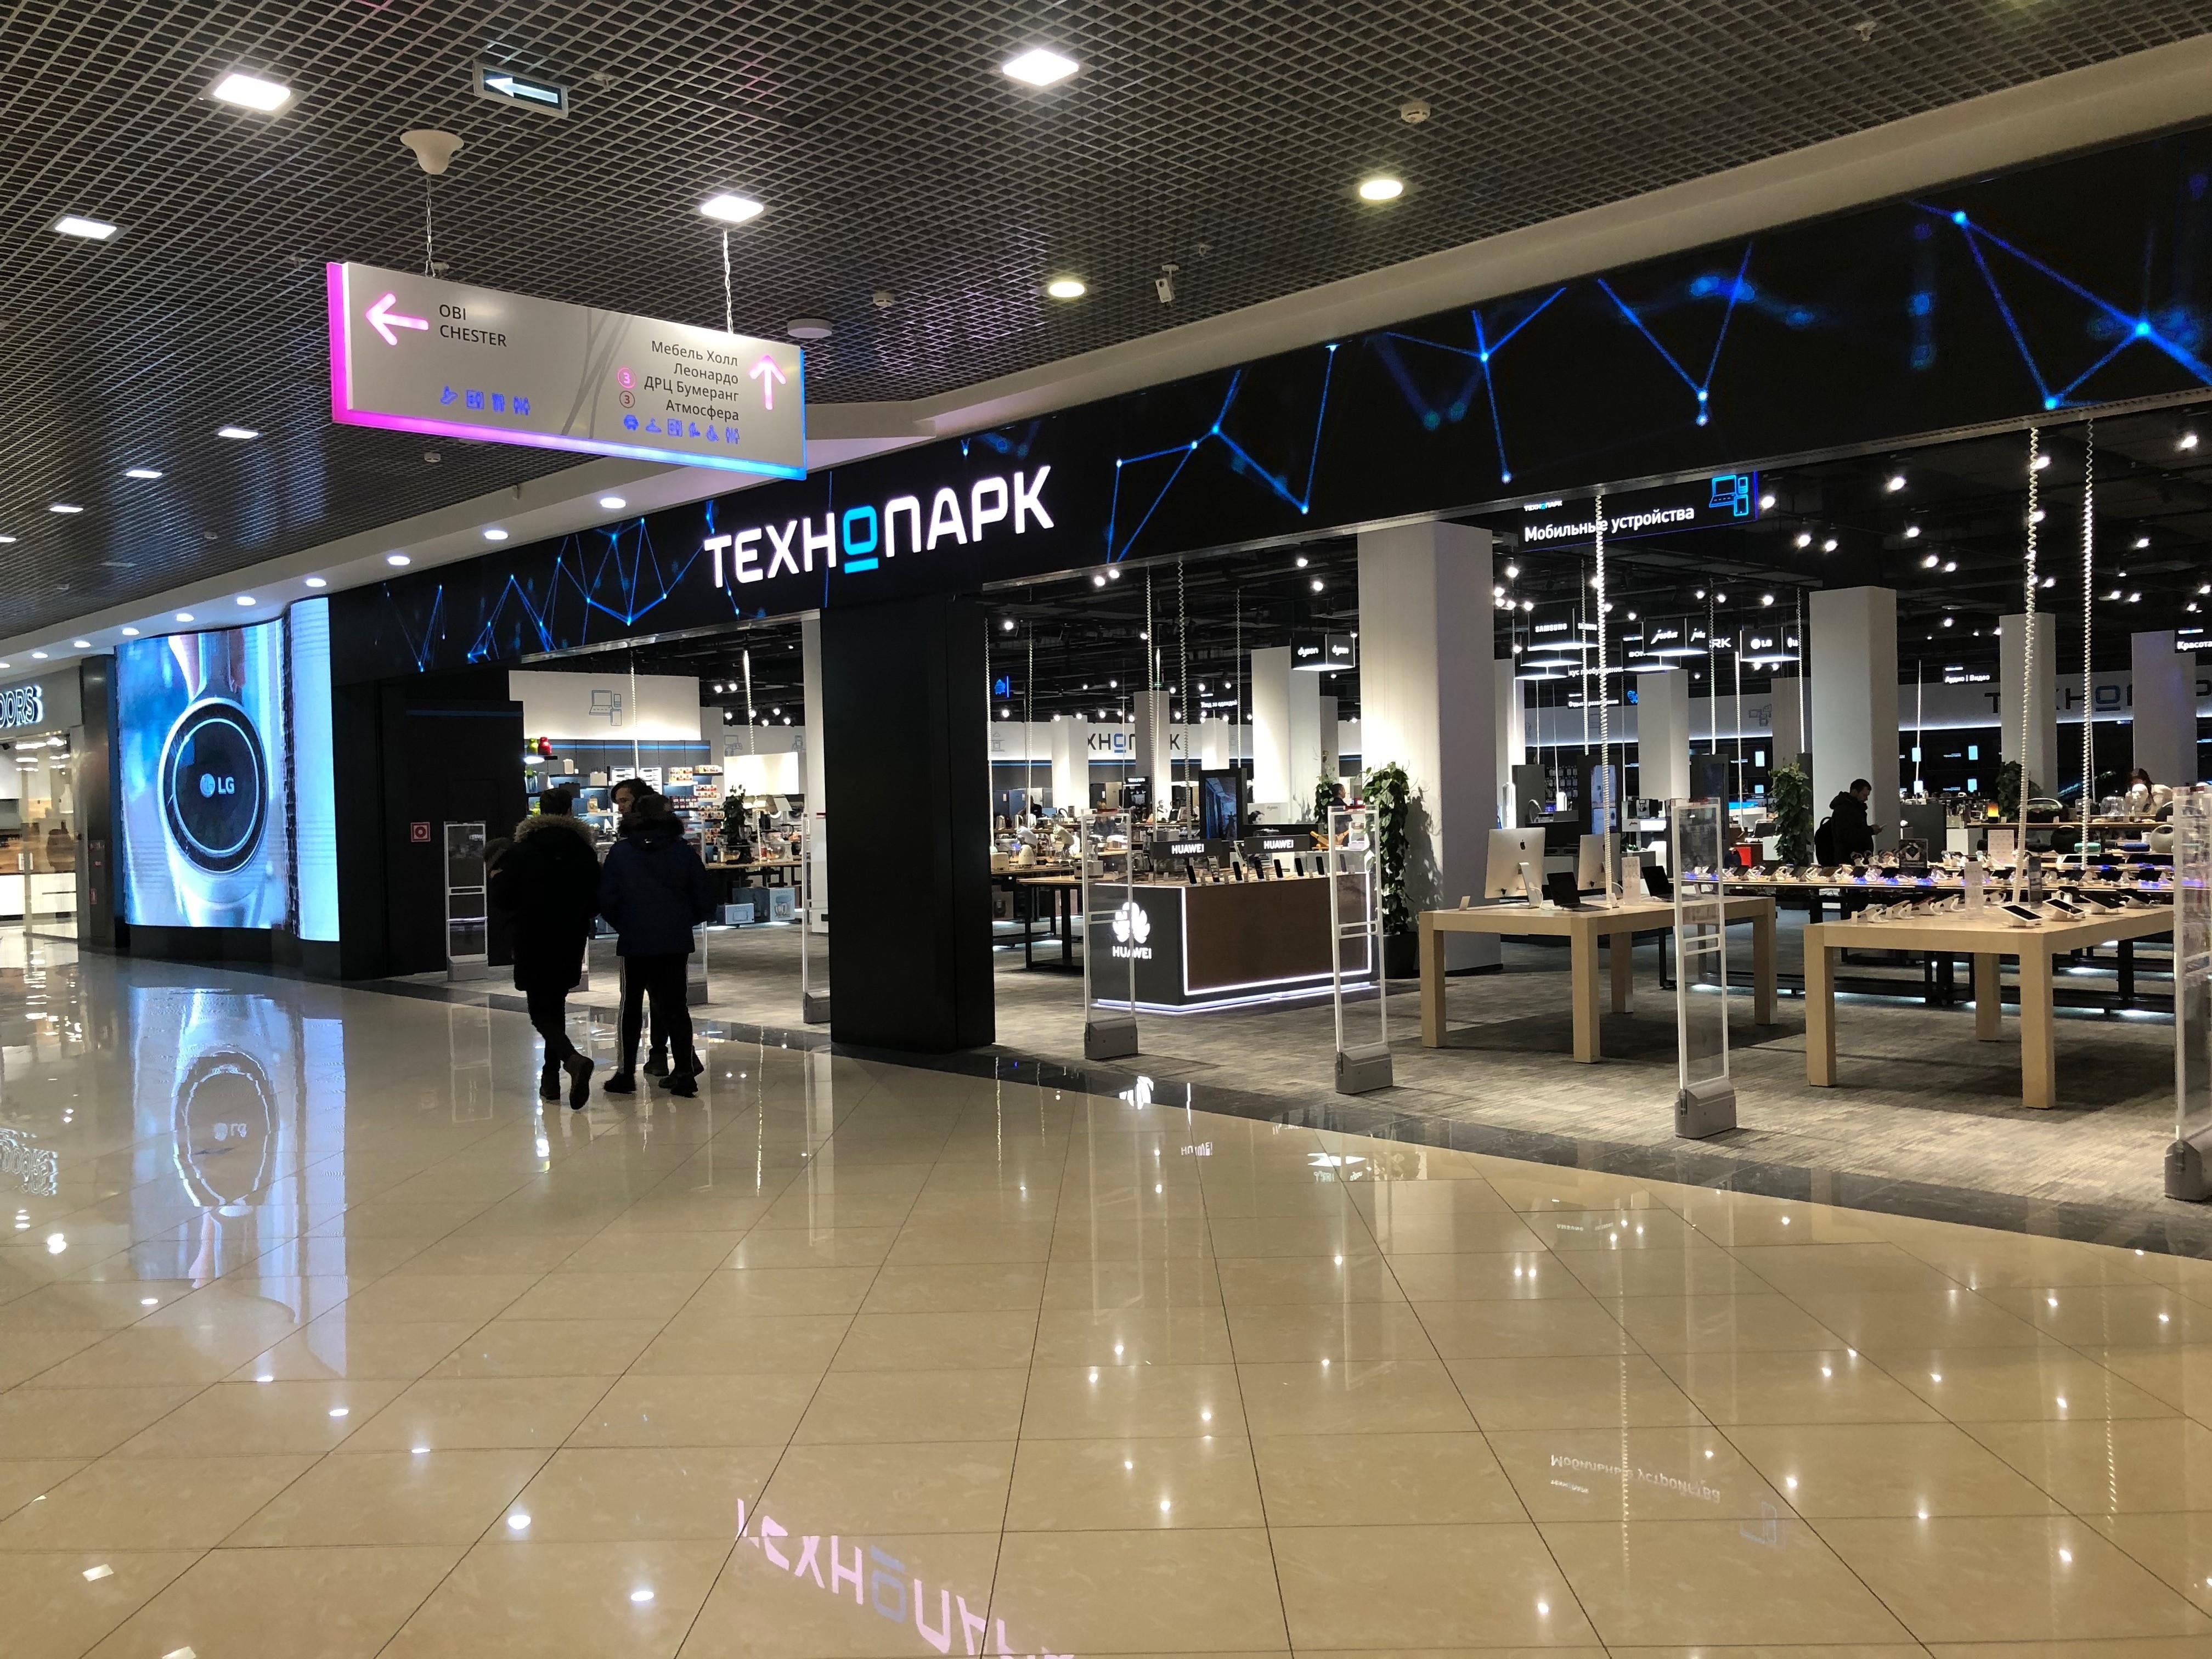 69a052edc Технопарк - магазин электроники, Брянск — отзывы и фото — Яндекс.Карты